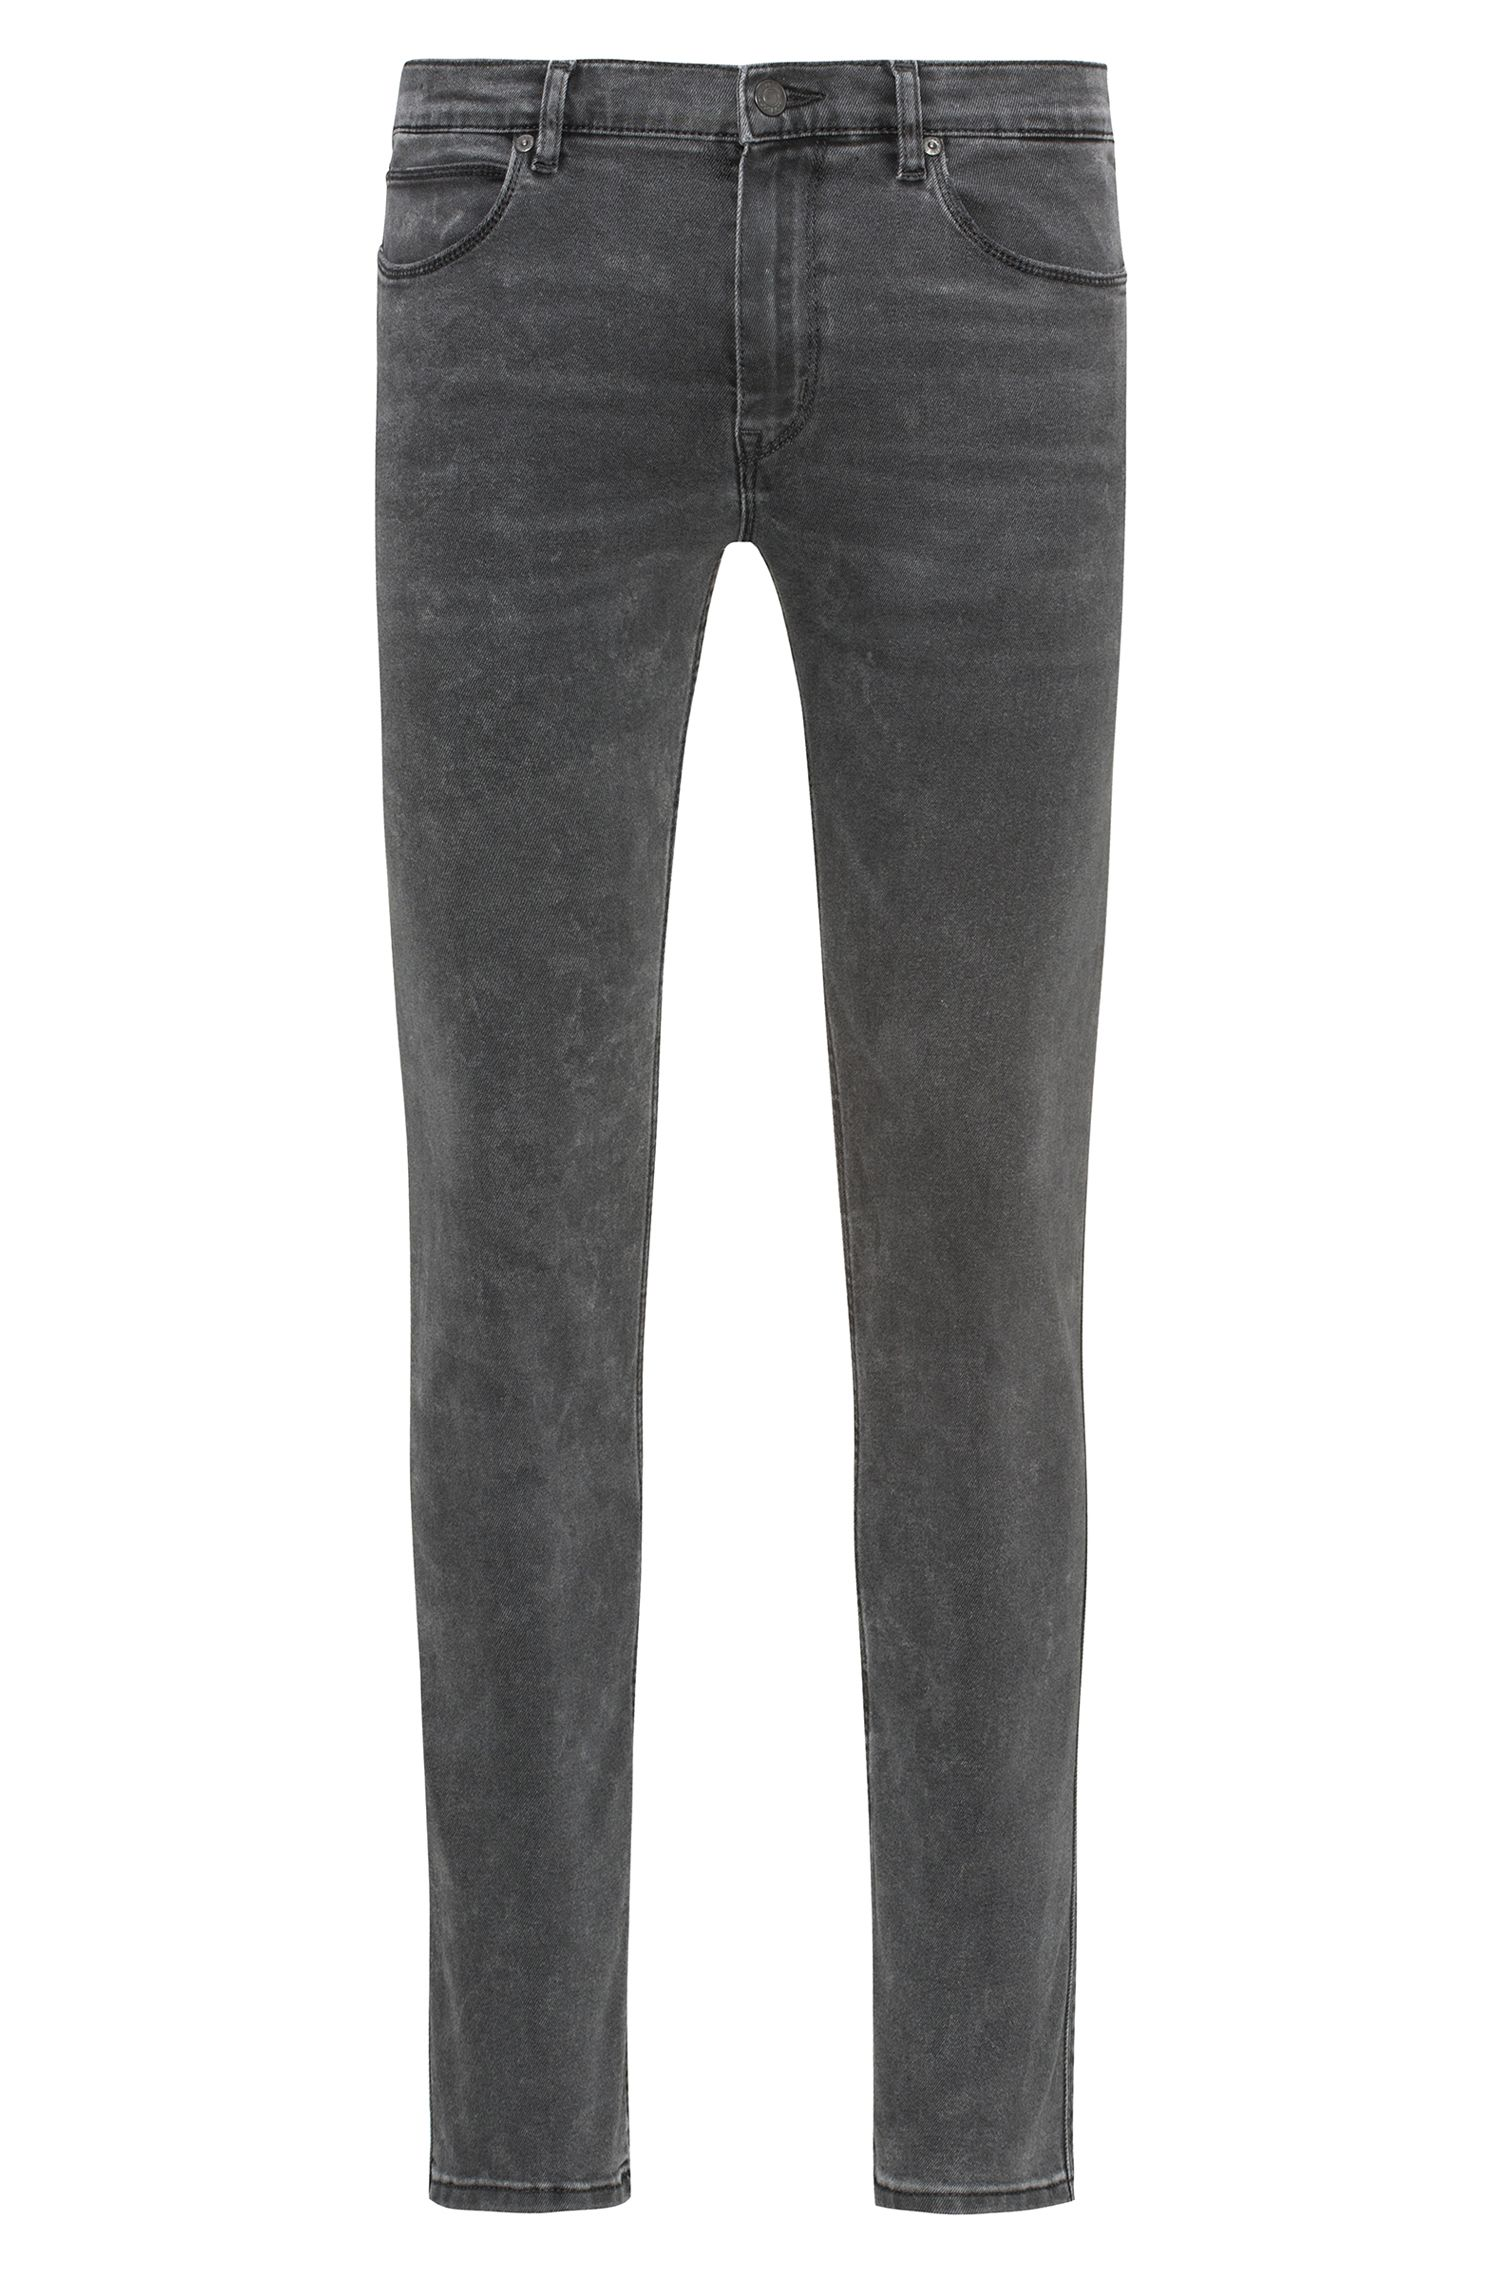 Jean Skinny Fit en denim stretch gris moyen délavé